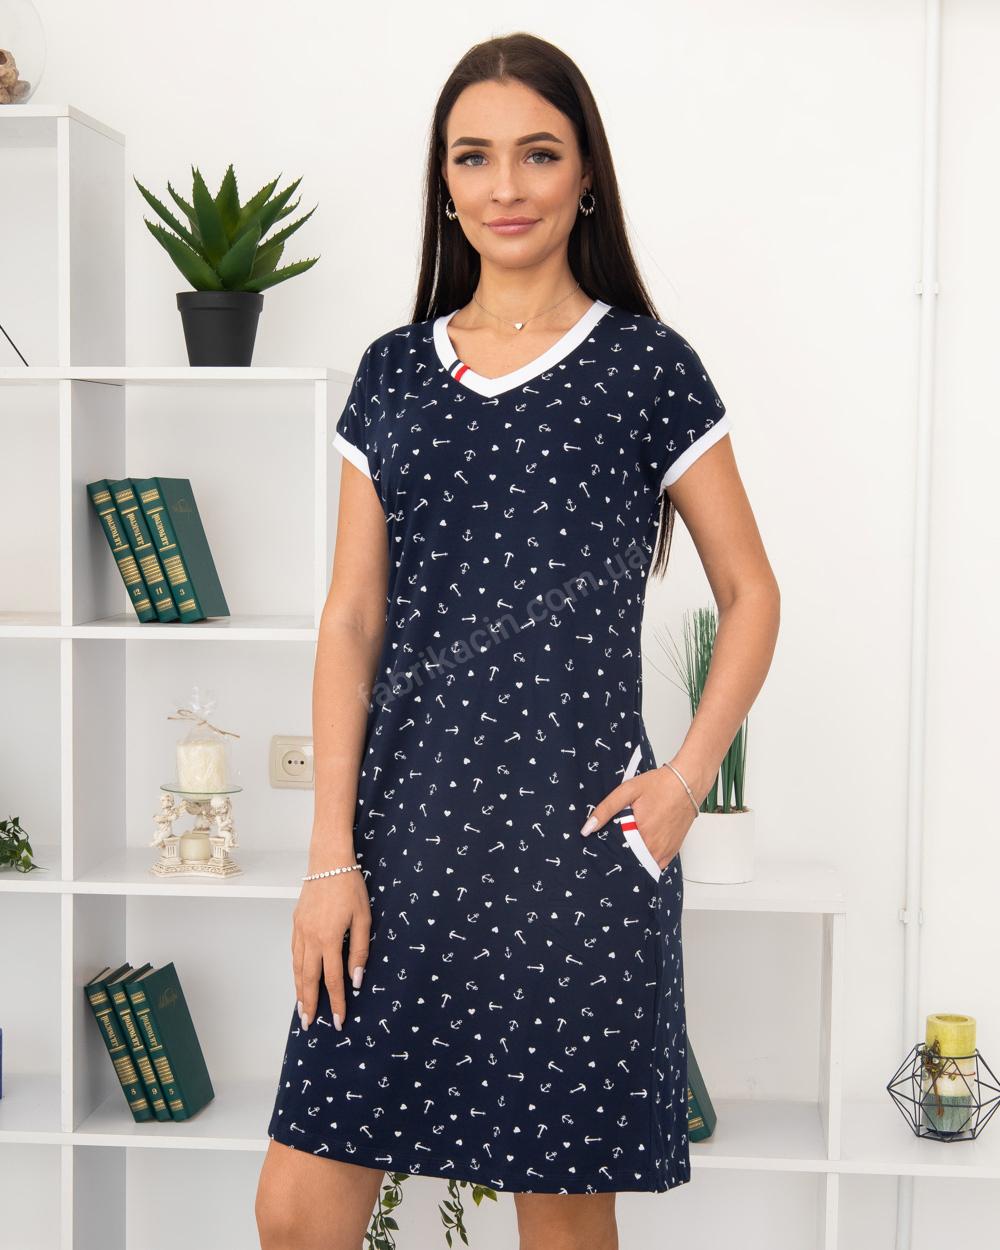 Платье Milvana Якорь, карманы 46-56, цвет: синий - 1